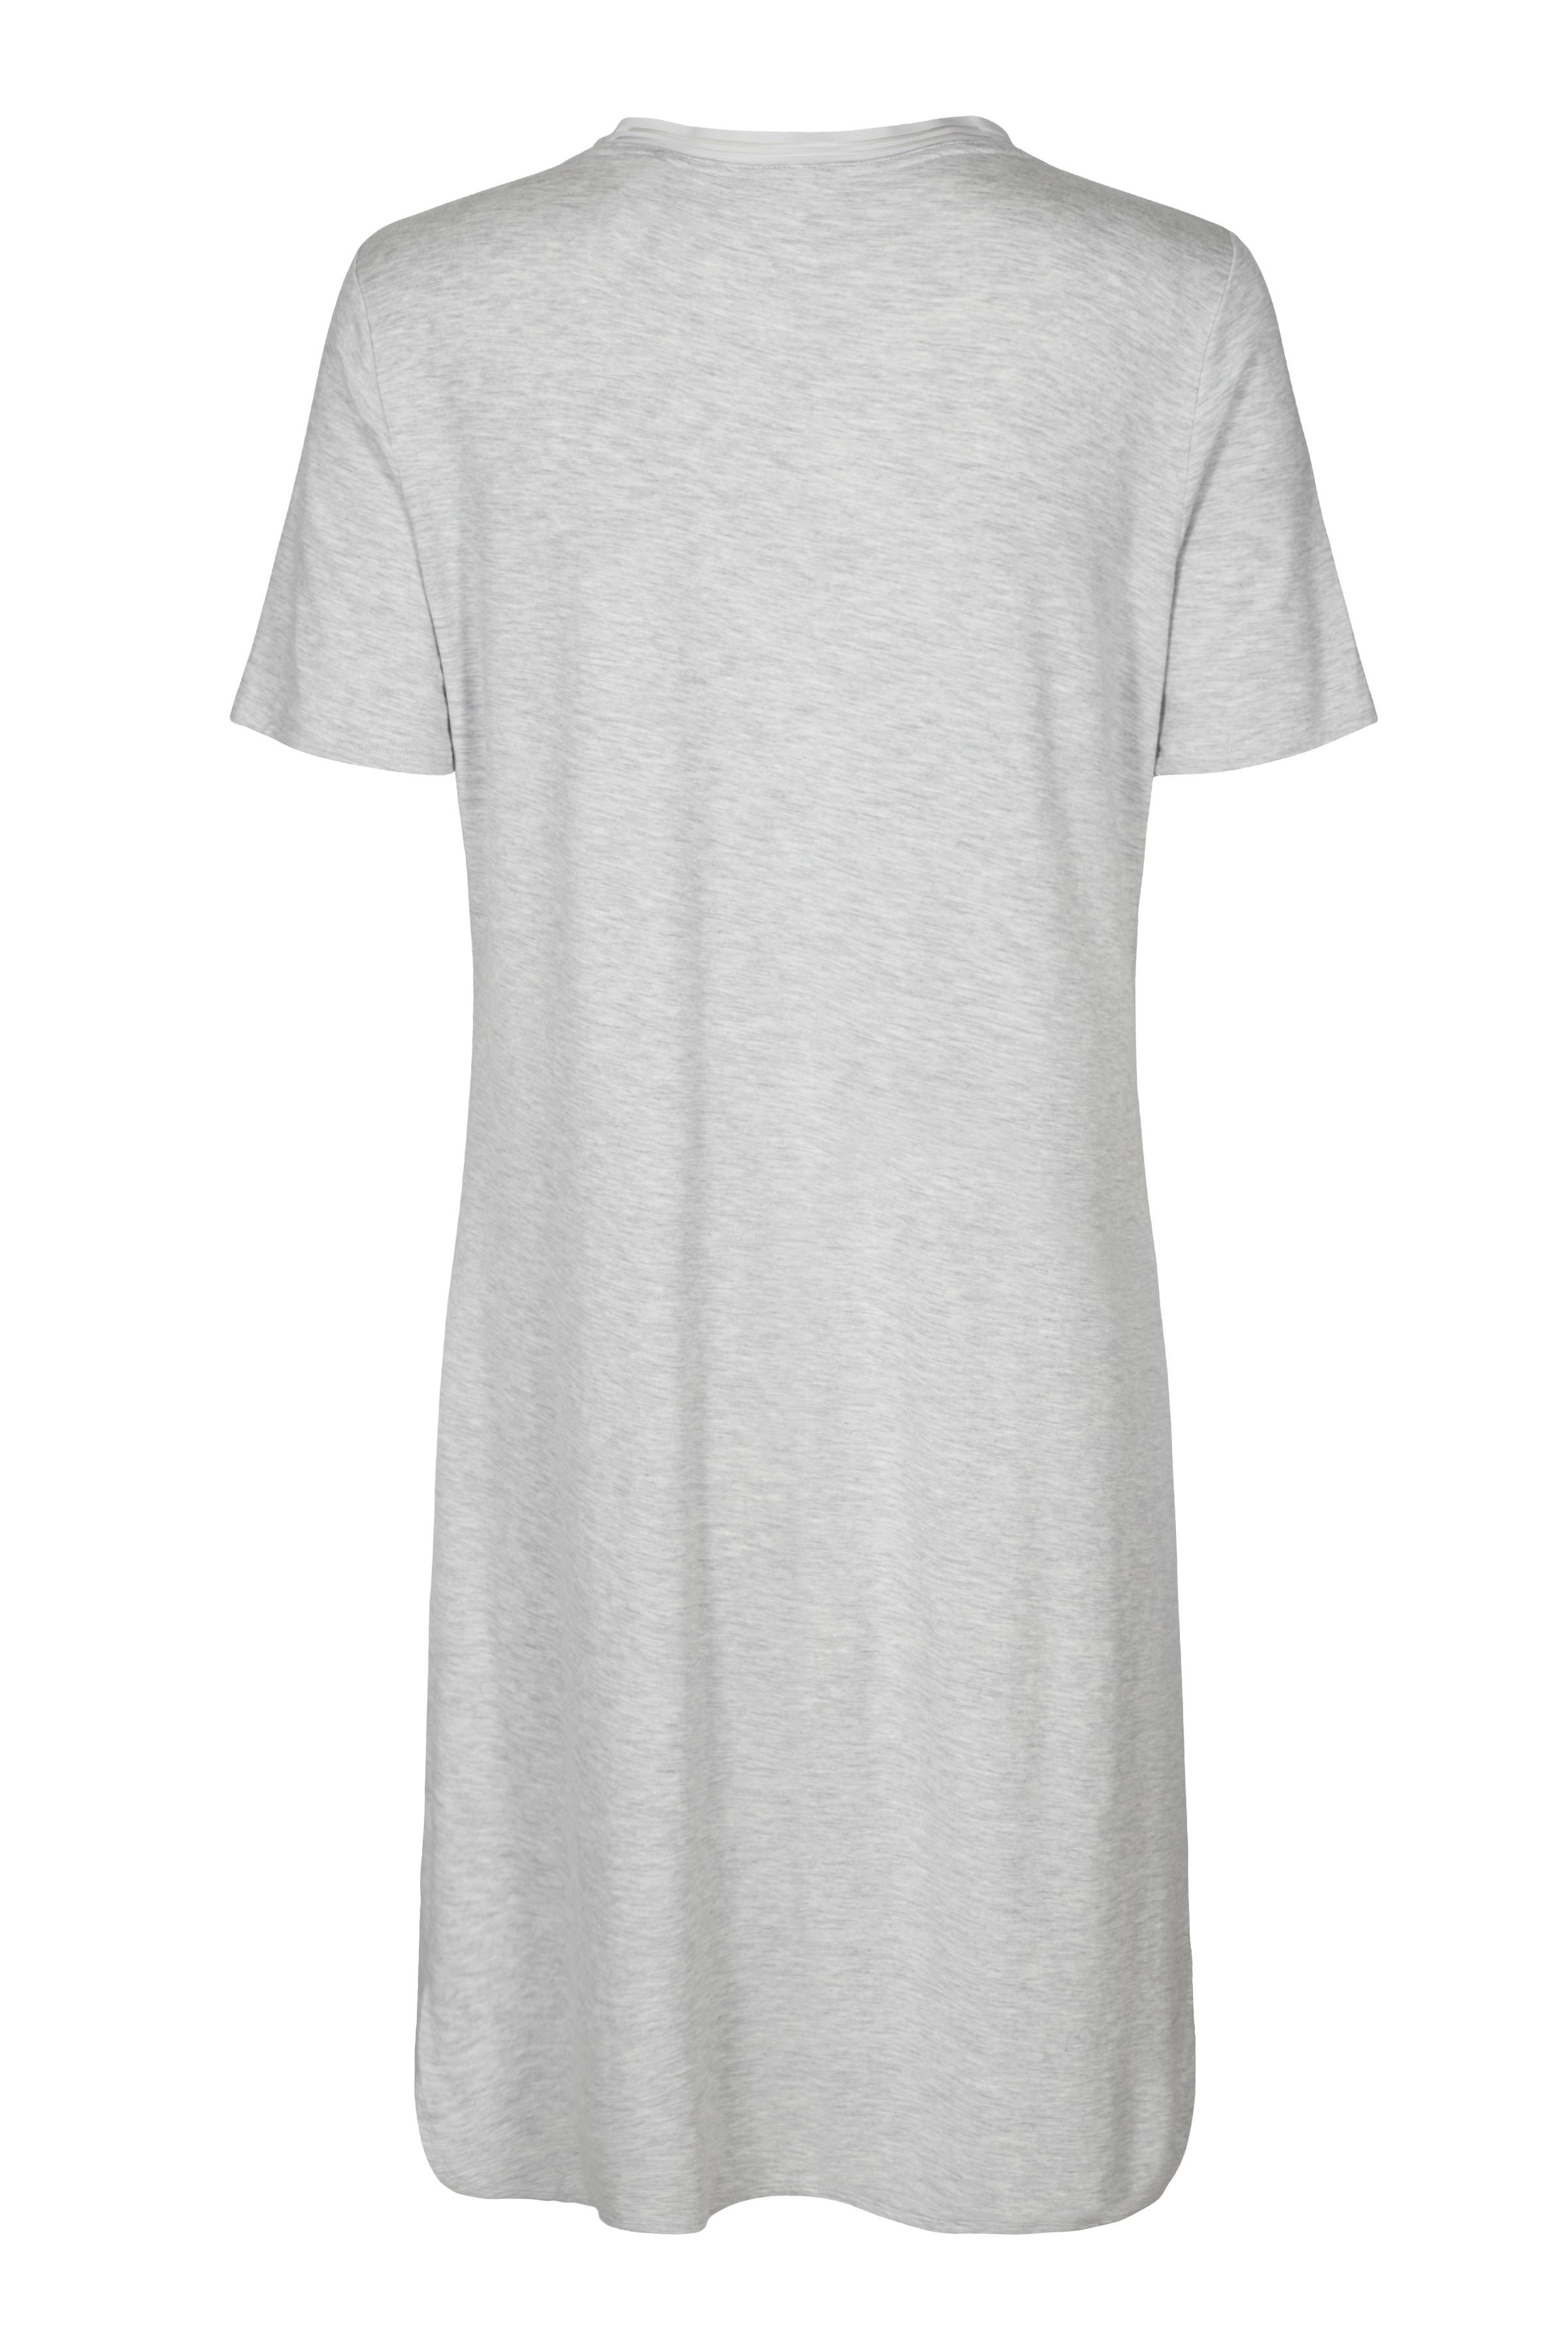 Grau meliert Homewear-Kleid - Climate Control von Triumph – Shoppen Sie Grau meliert Homewear-Kleid - Climate Control ab Gr. 38-48 hier